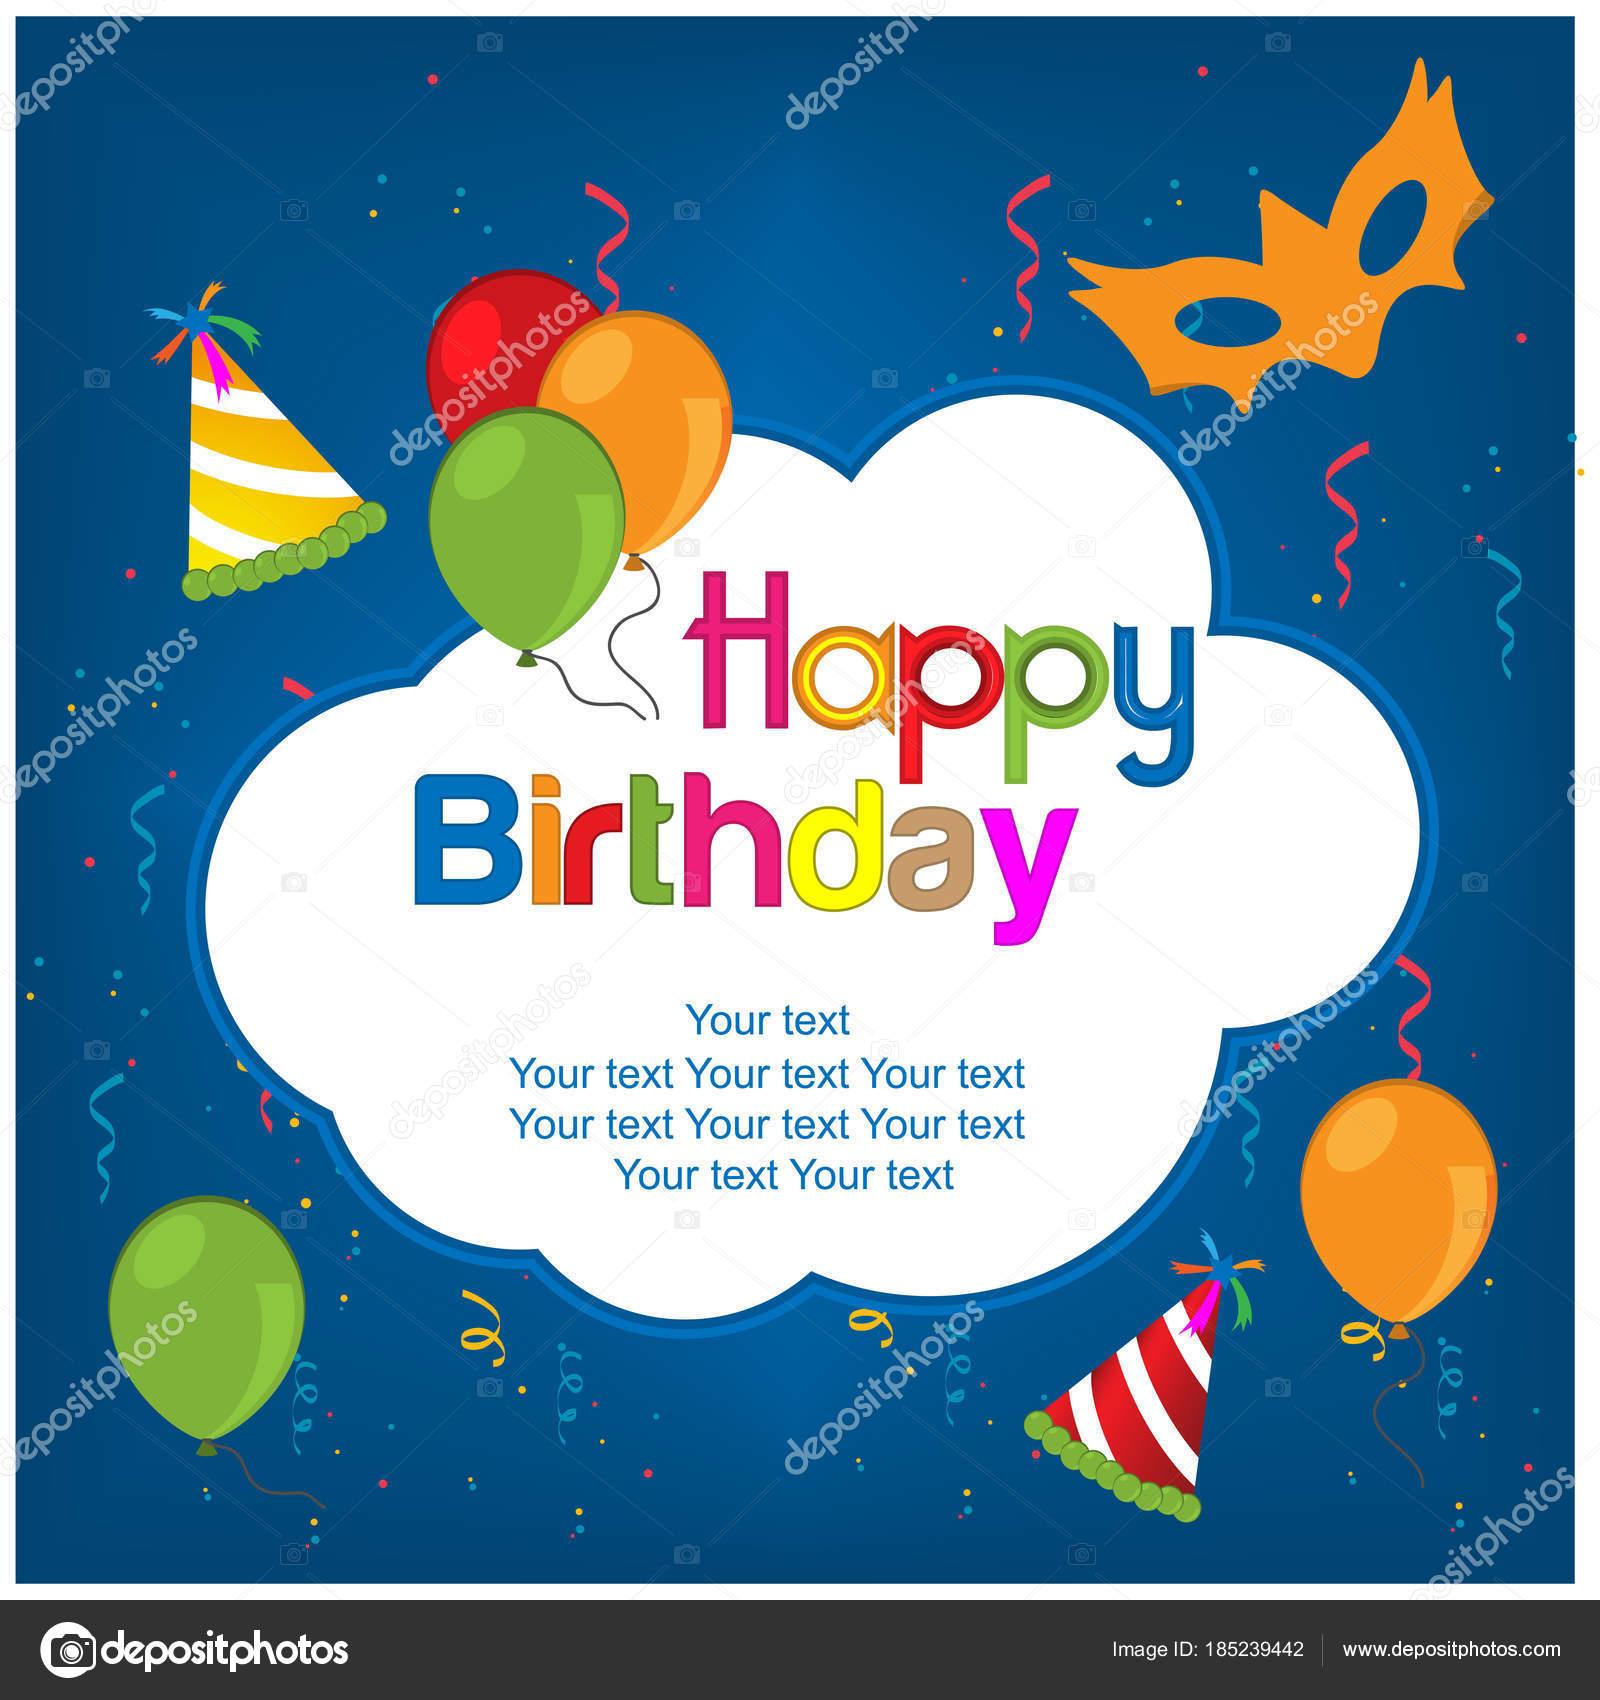 Happy Birthday Vector Design Blue Background Stock Vector C Sarya